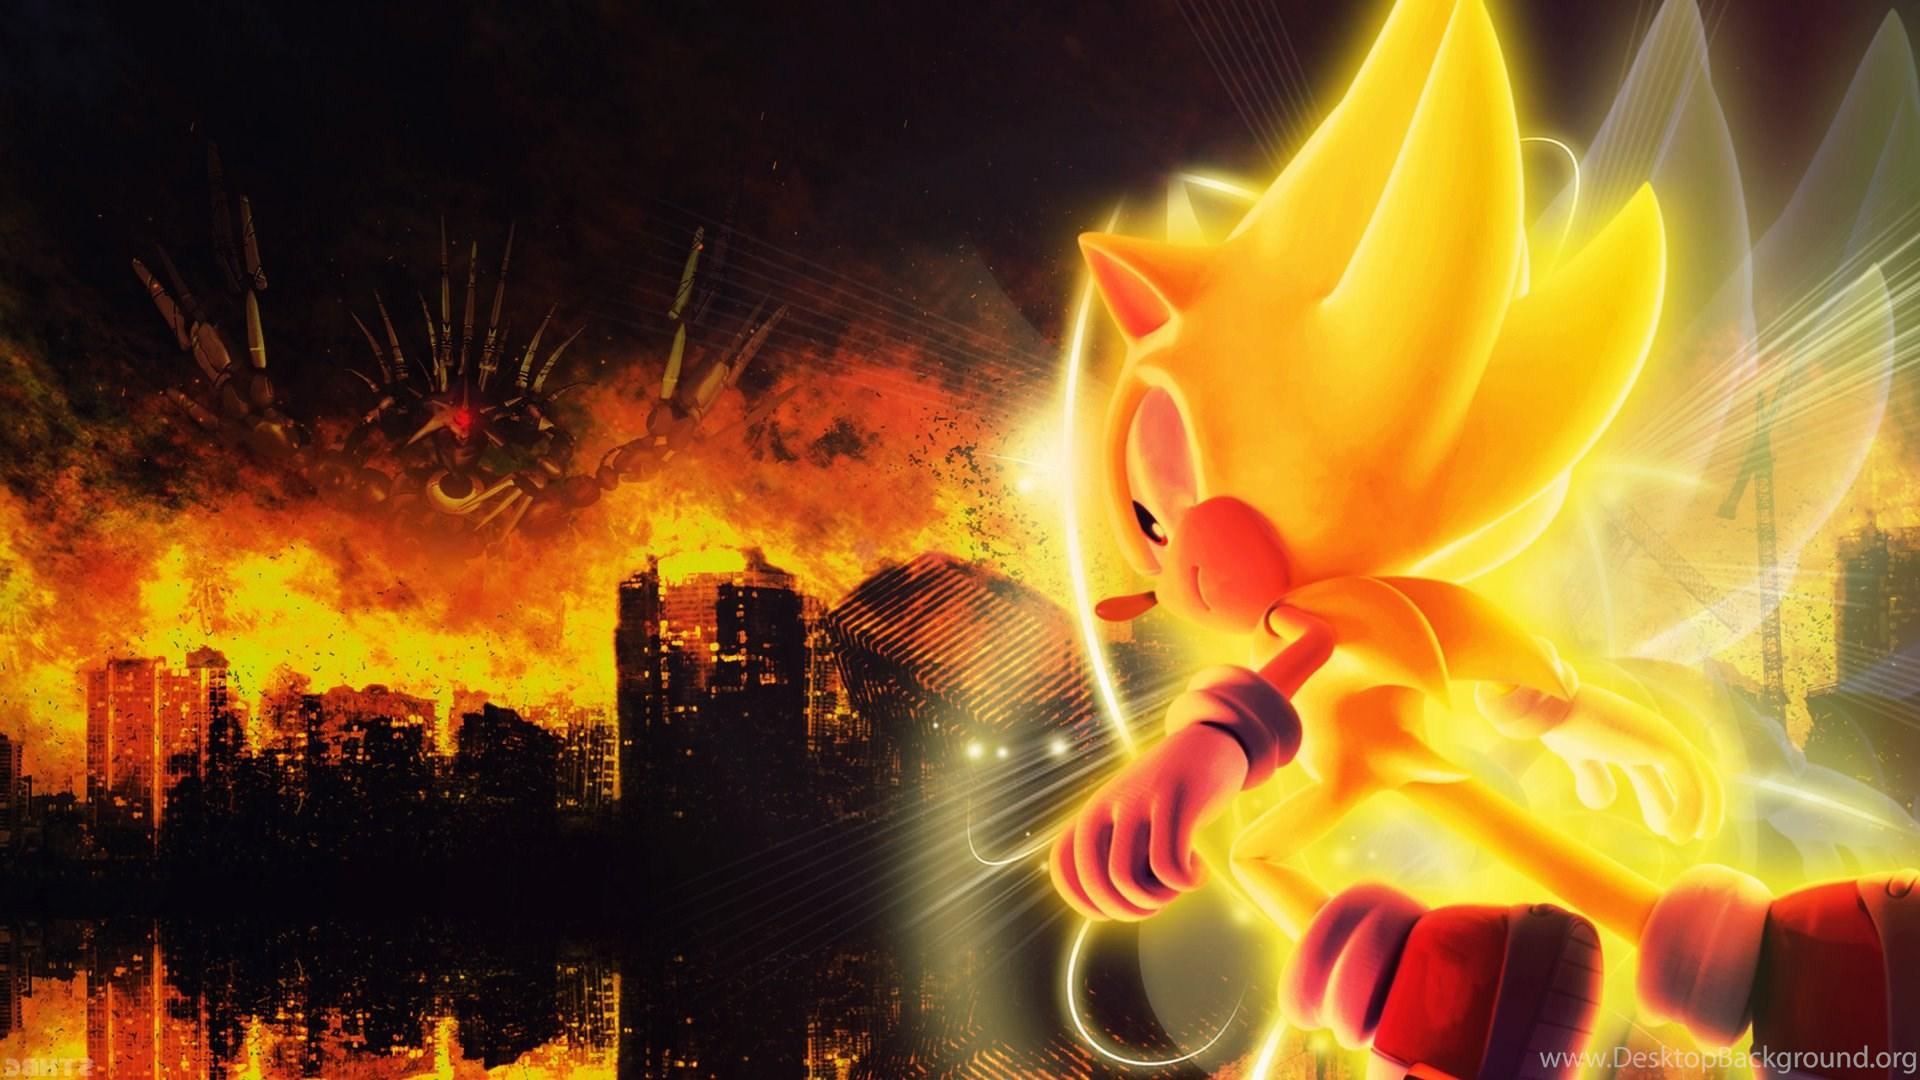 Download super sonic wallpaper images desktop background - Super sonic wallpaper free download ...